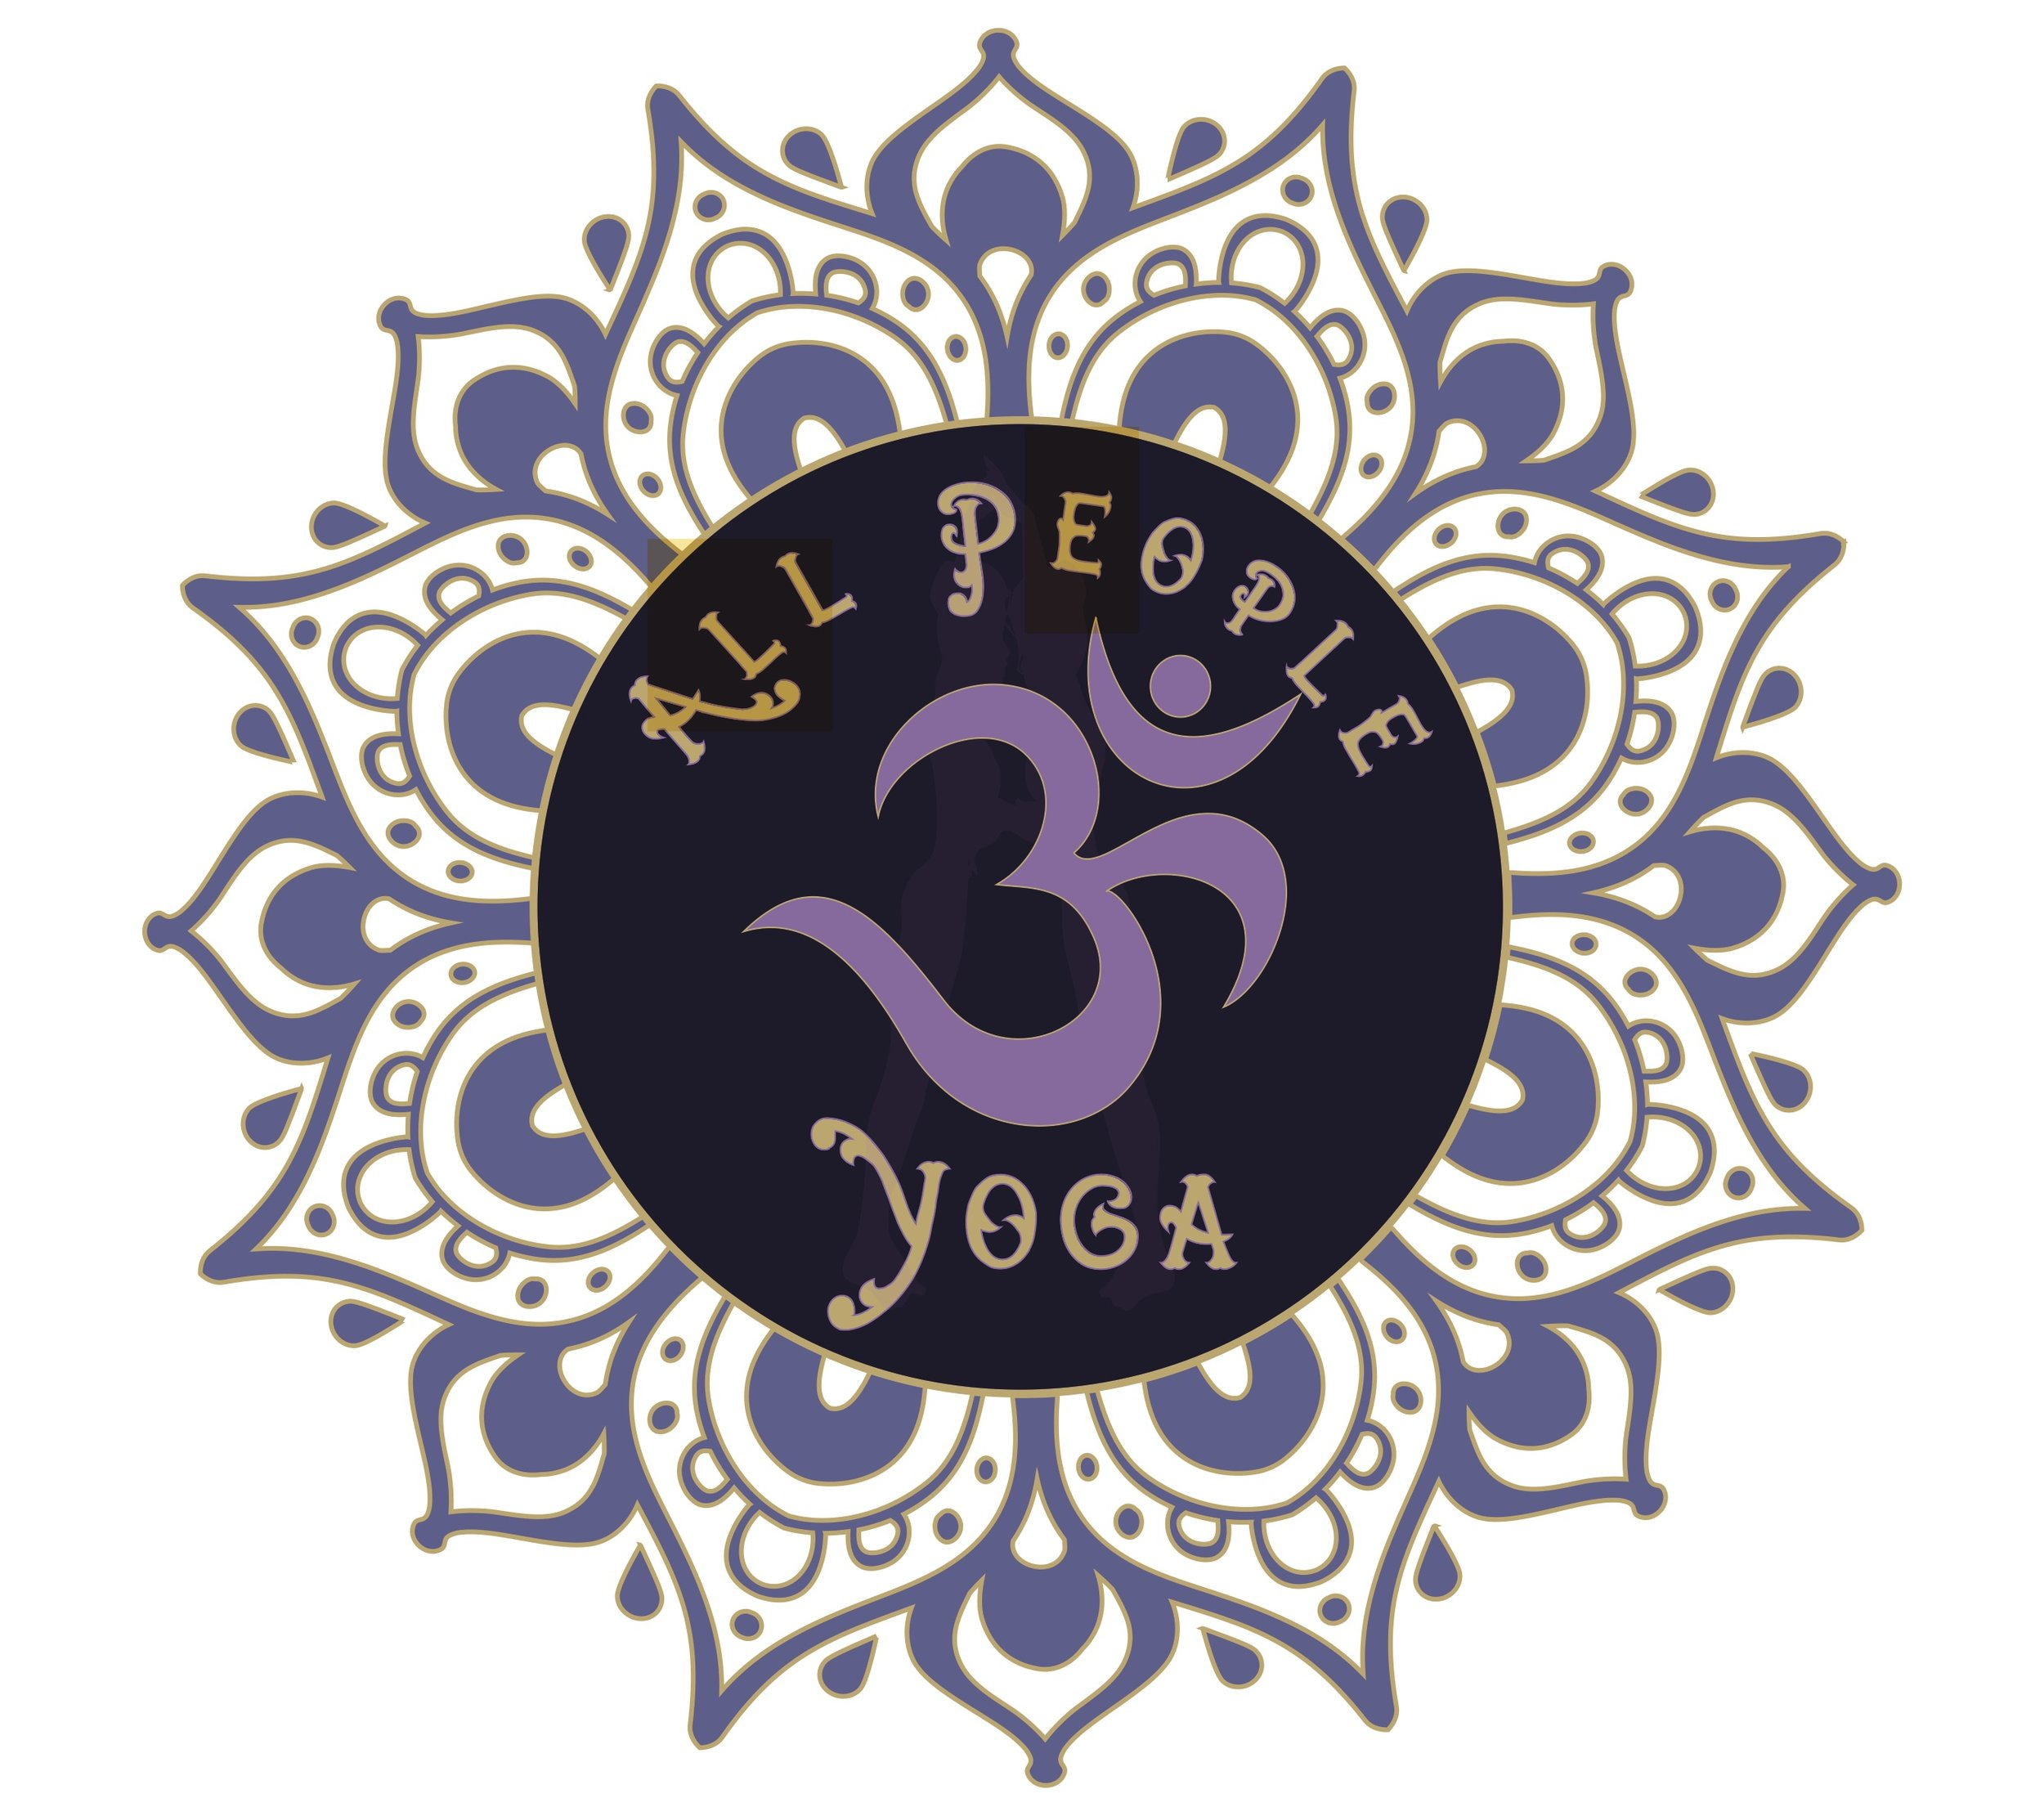 All People Yoga